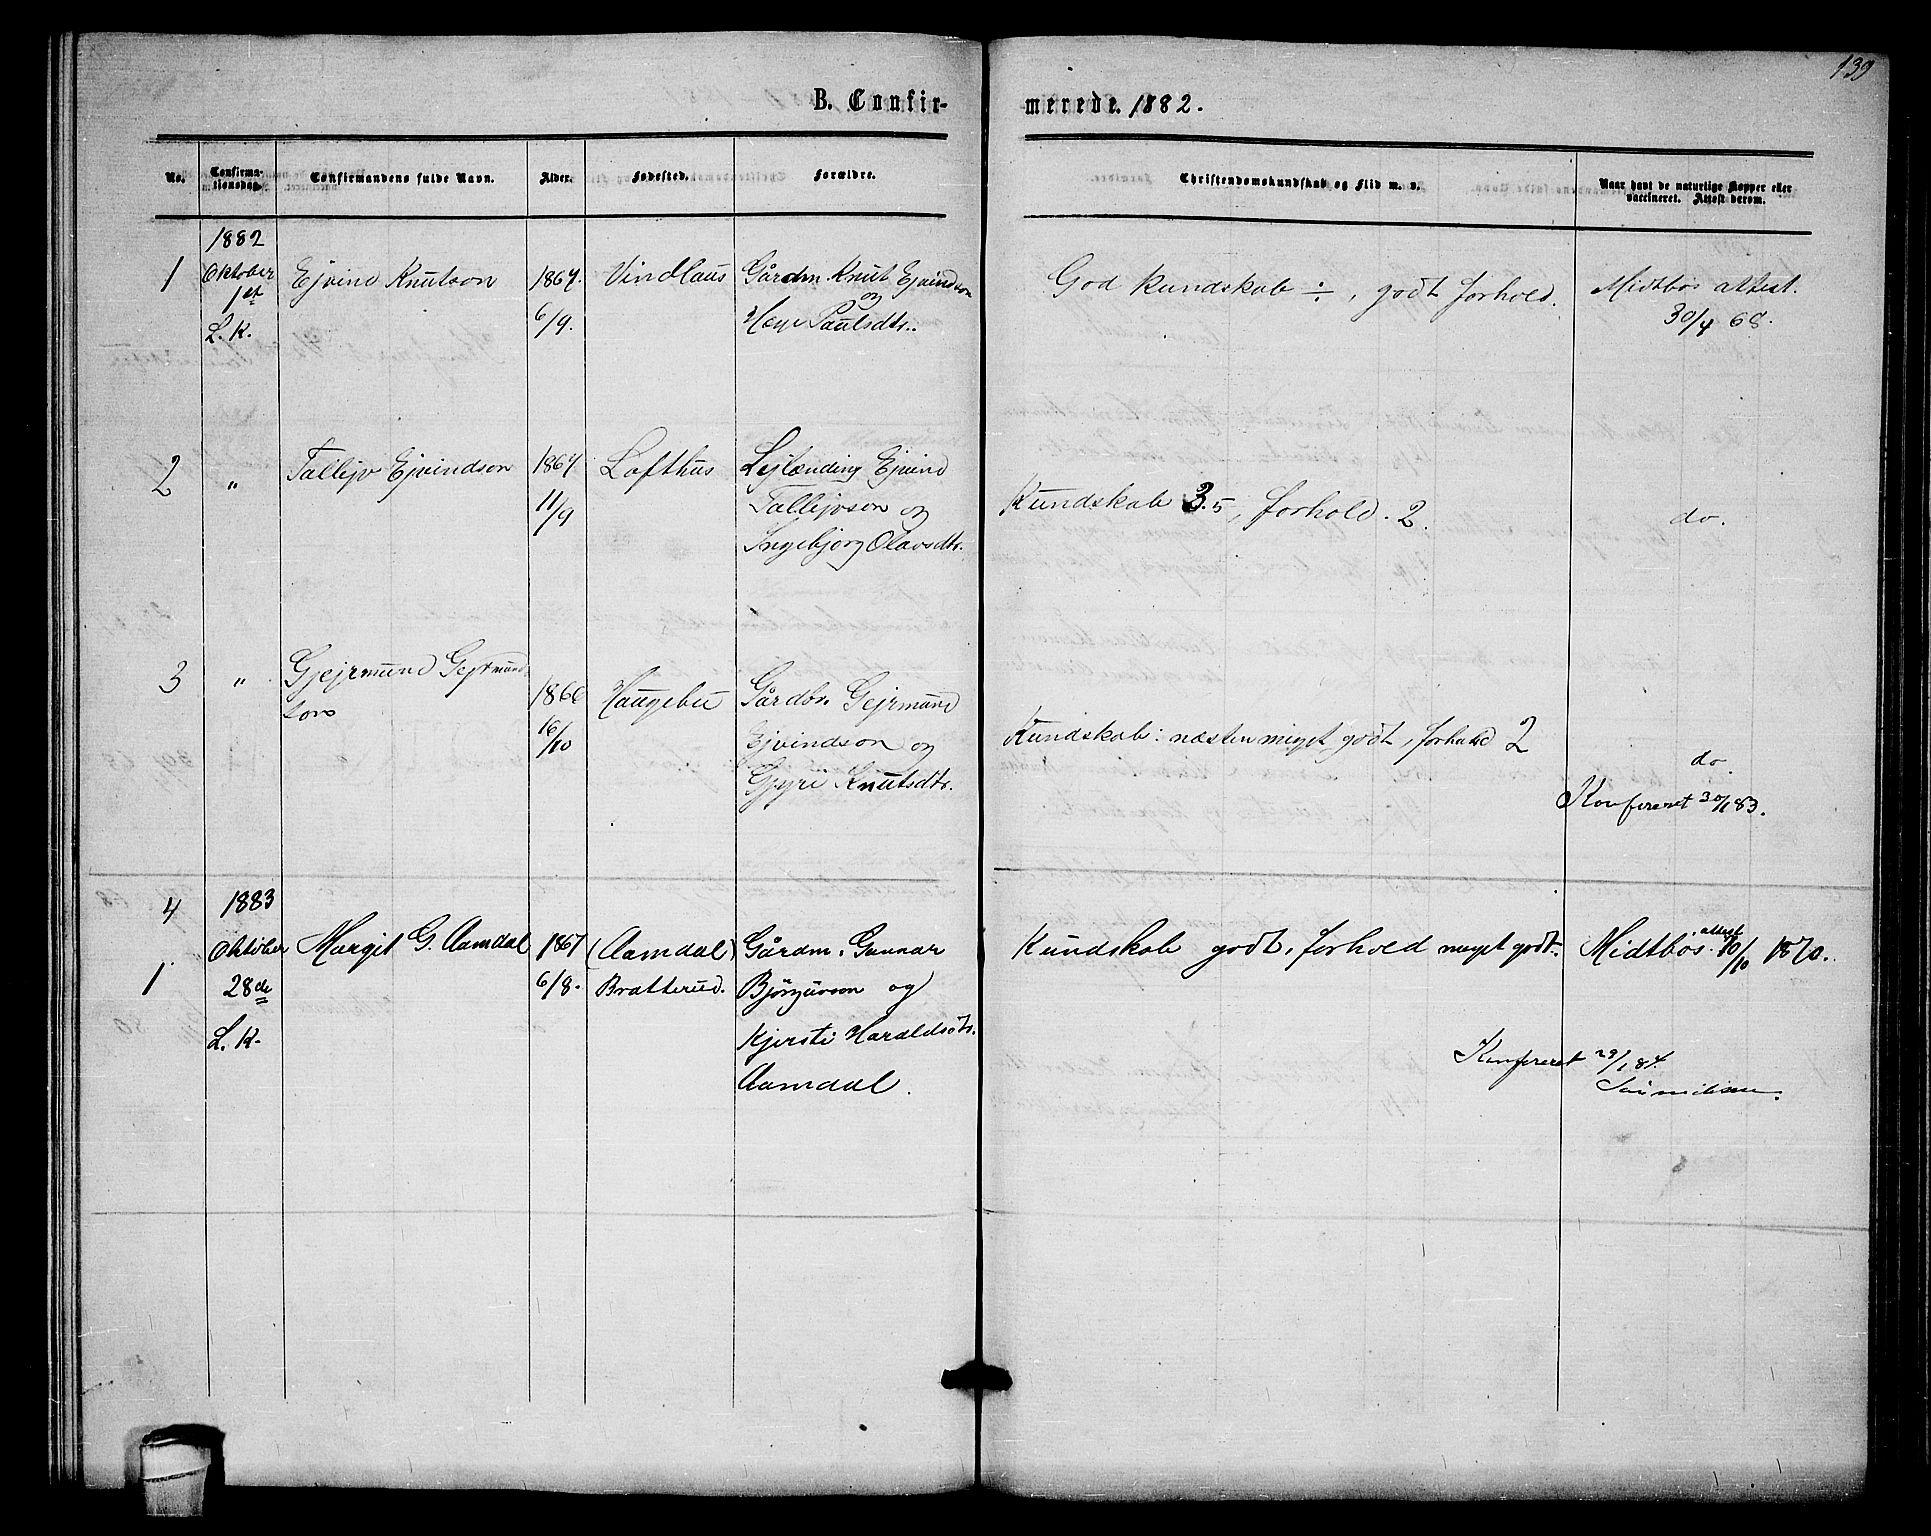 SAKO, Lårdal kirkebøker, G/Gb/L0002: Klokkerbok nr. II 2, 1865-1888, s. 139